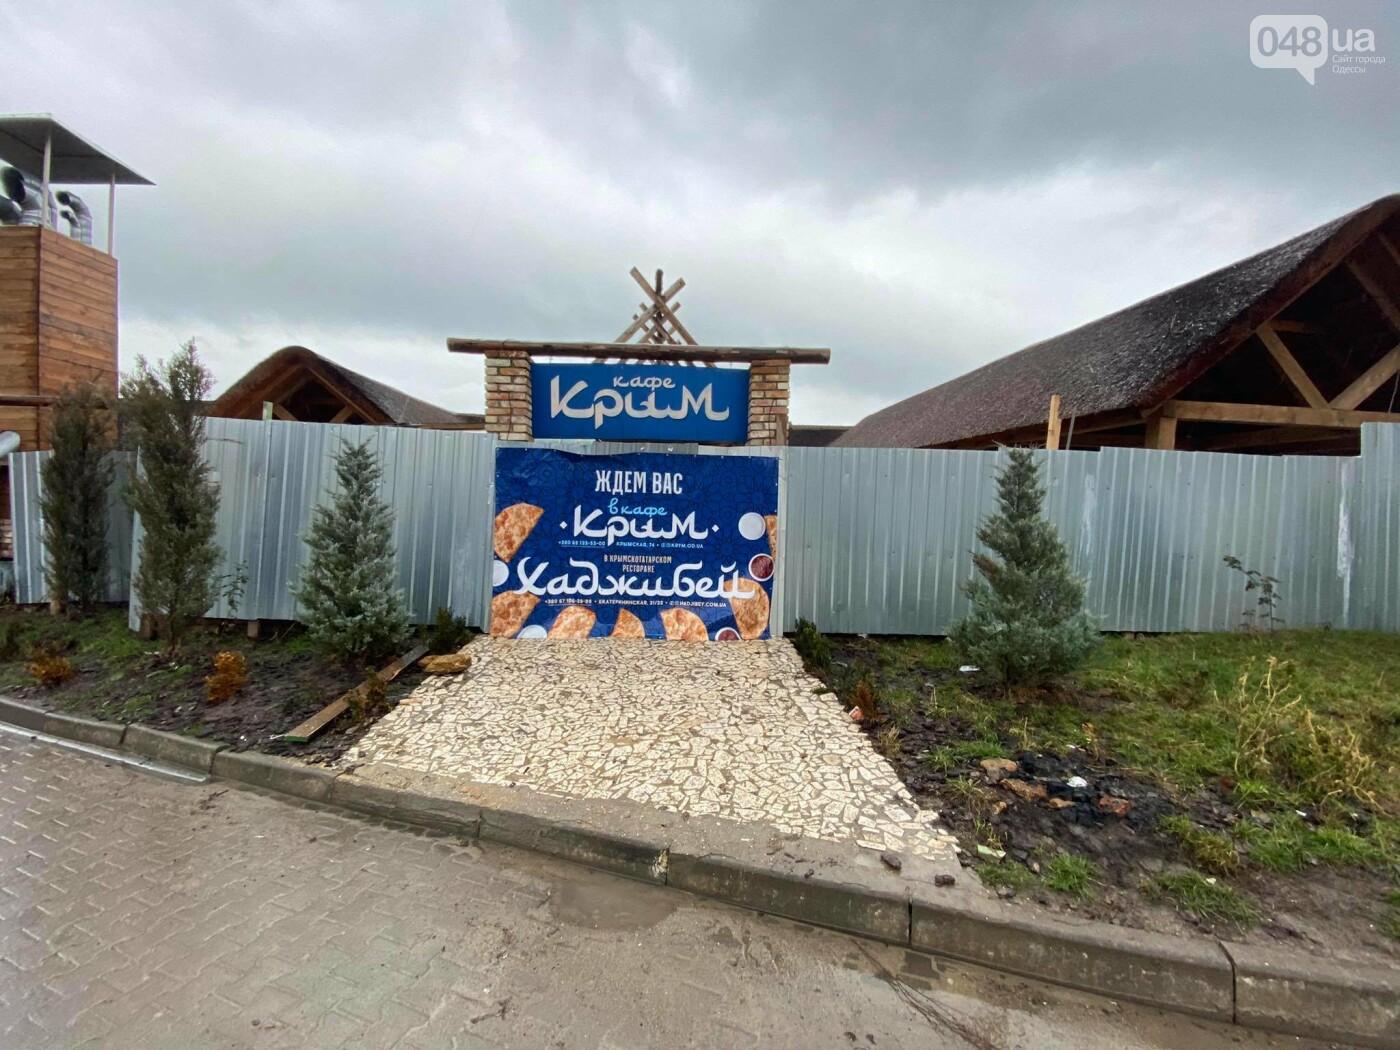 В Аркадии на побережье активист нашел незаконную стройку,- ФОТО, ВИДЕО, фото-7